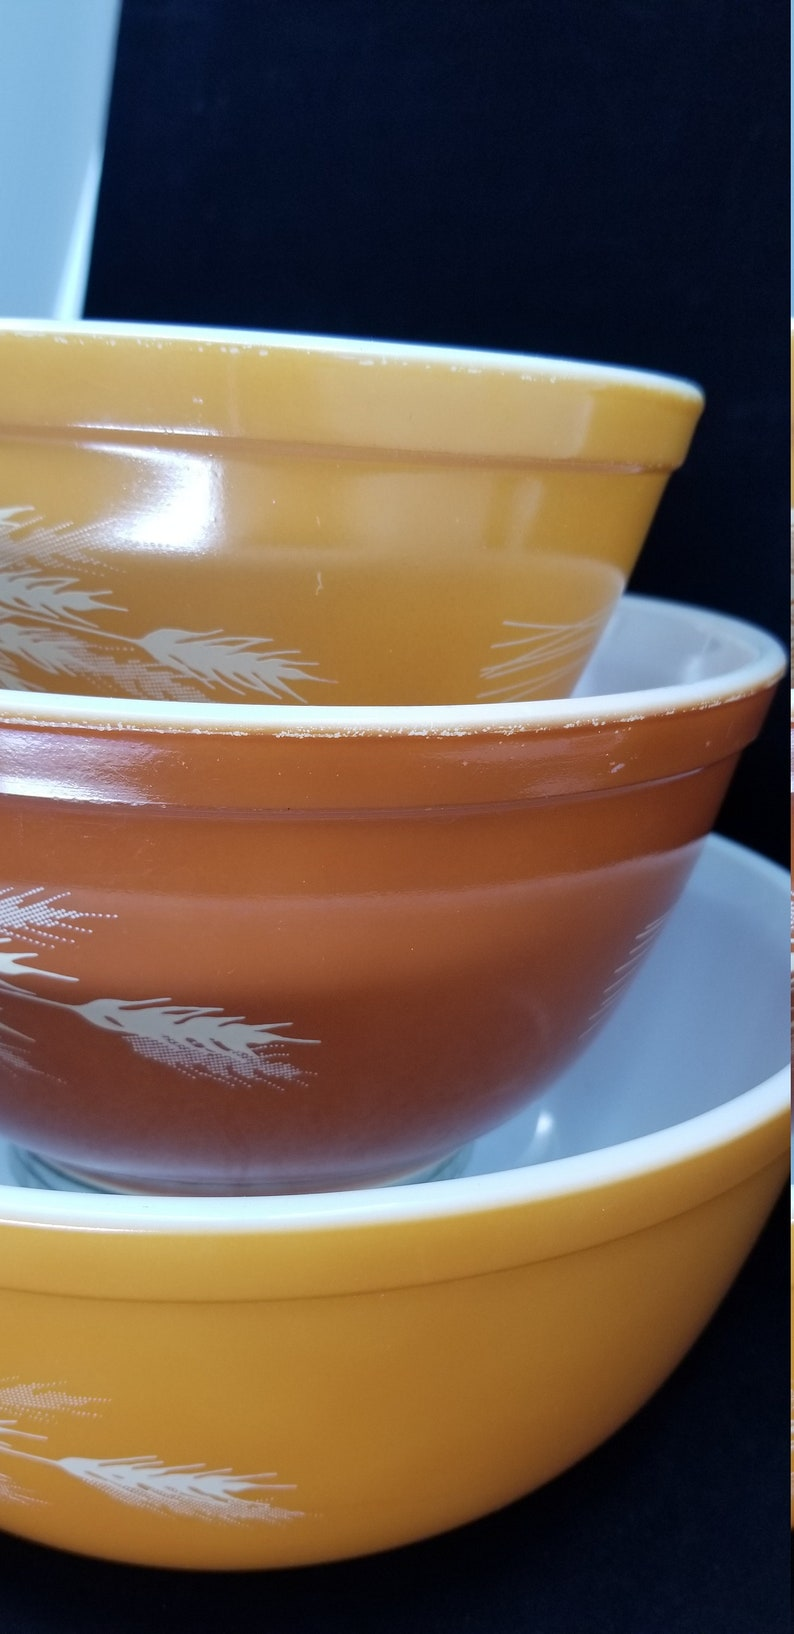 401 PYREX Autumn Harvest Nested Mixing Bowl Set 403 Rust /& Orange 1979-86 402